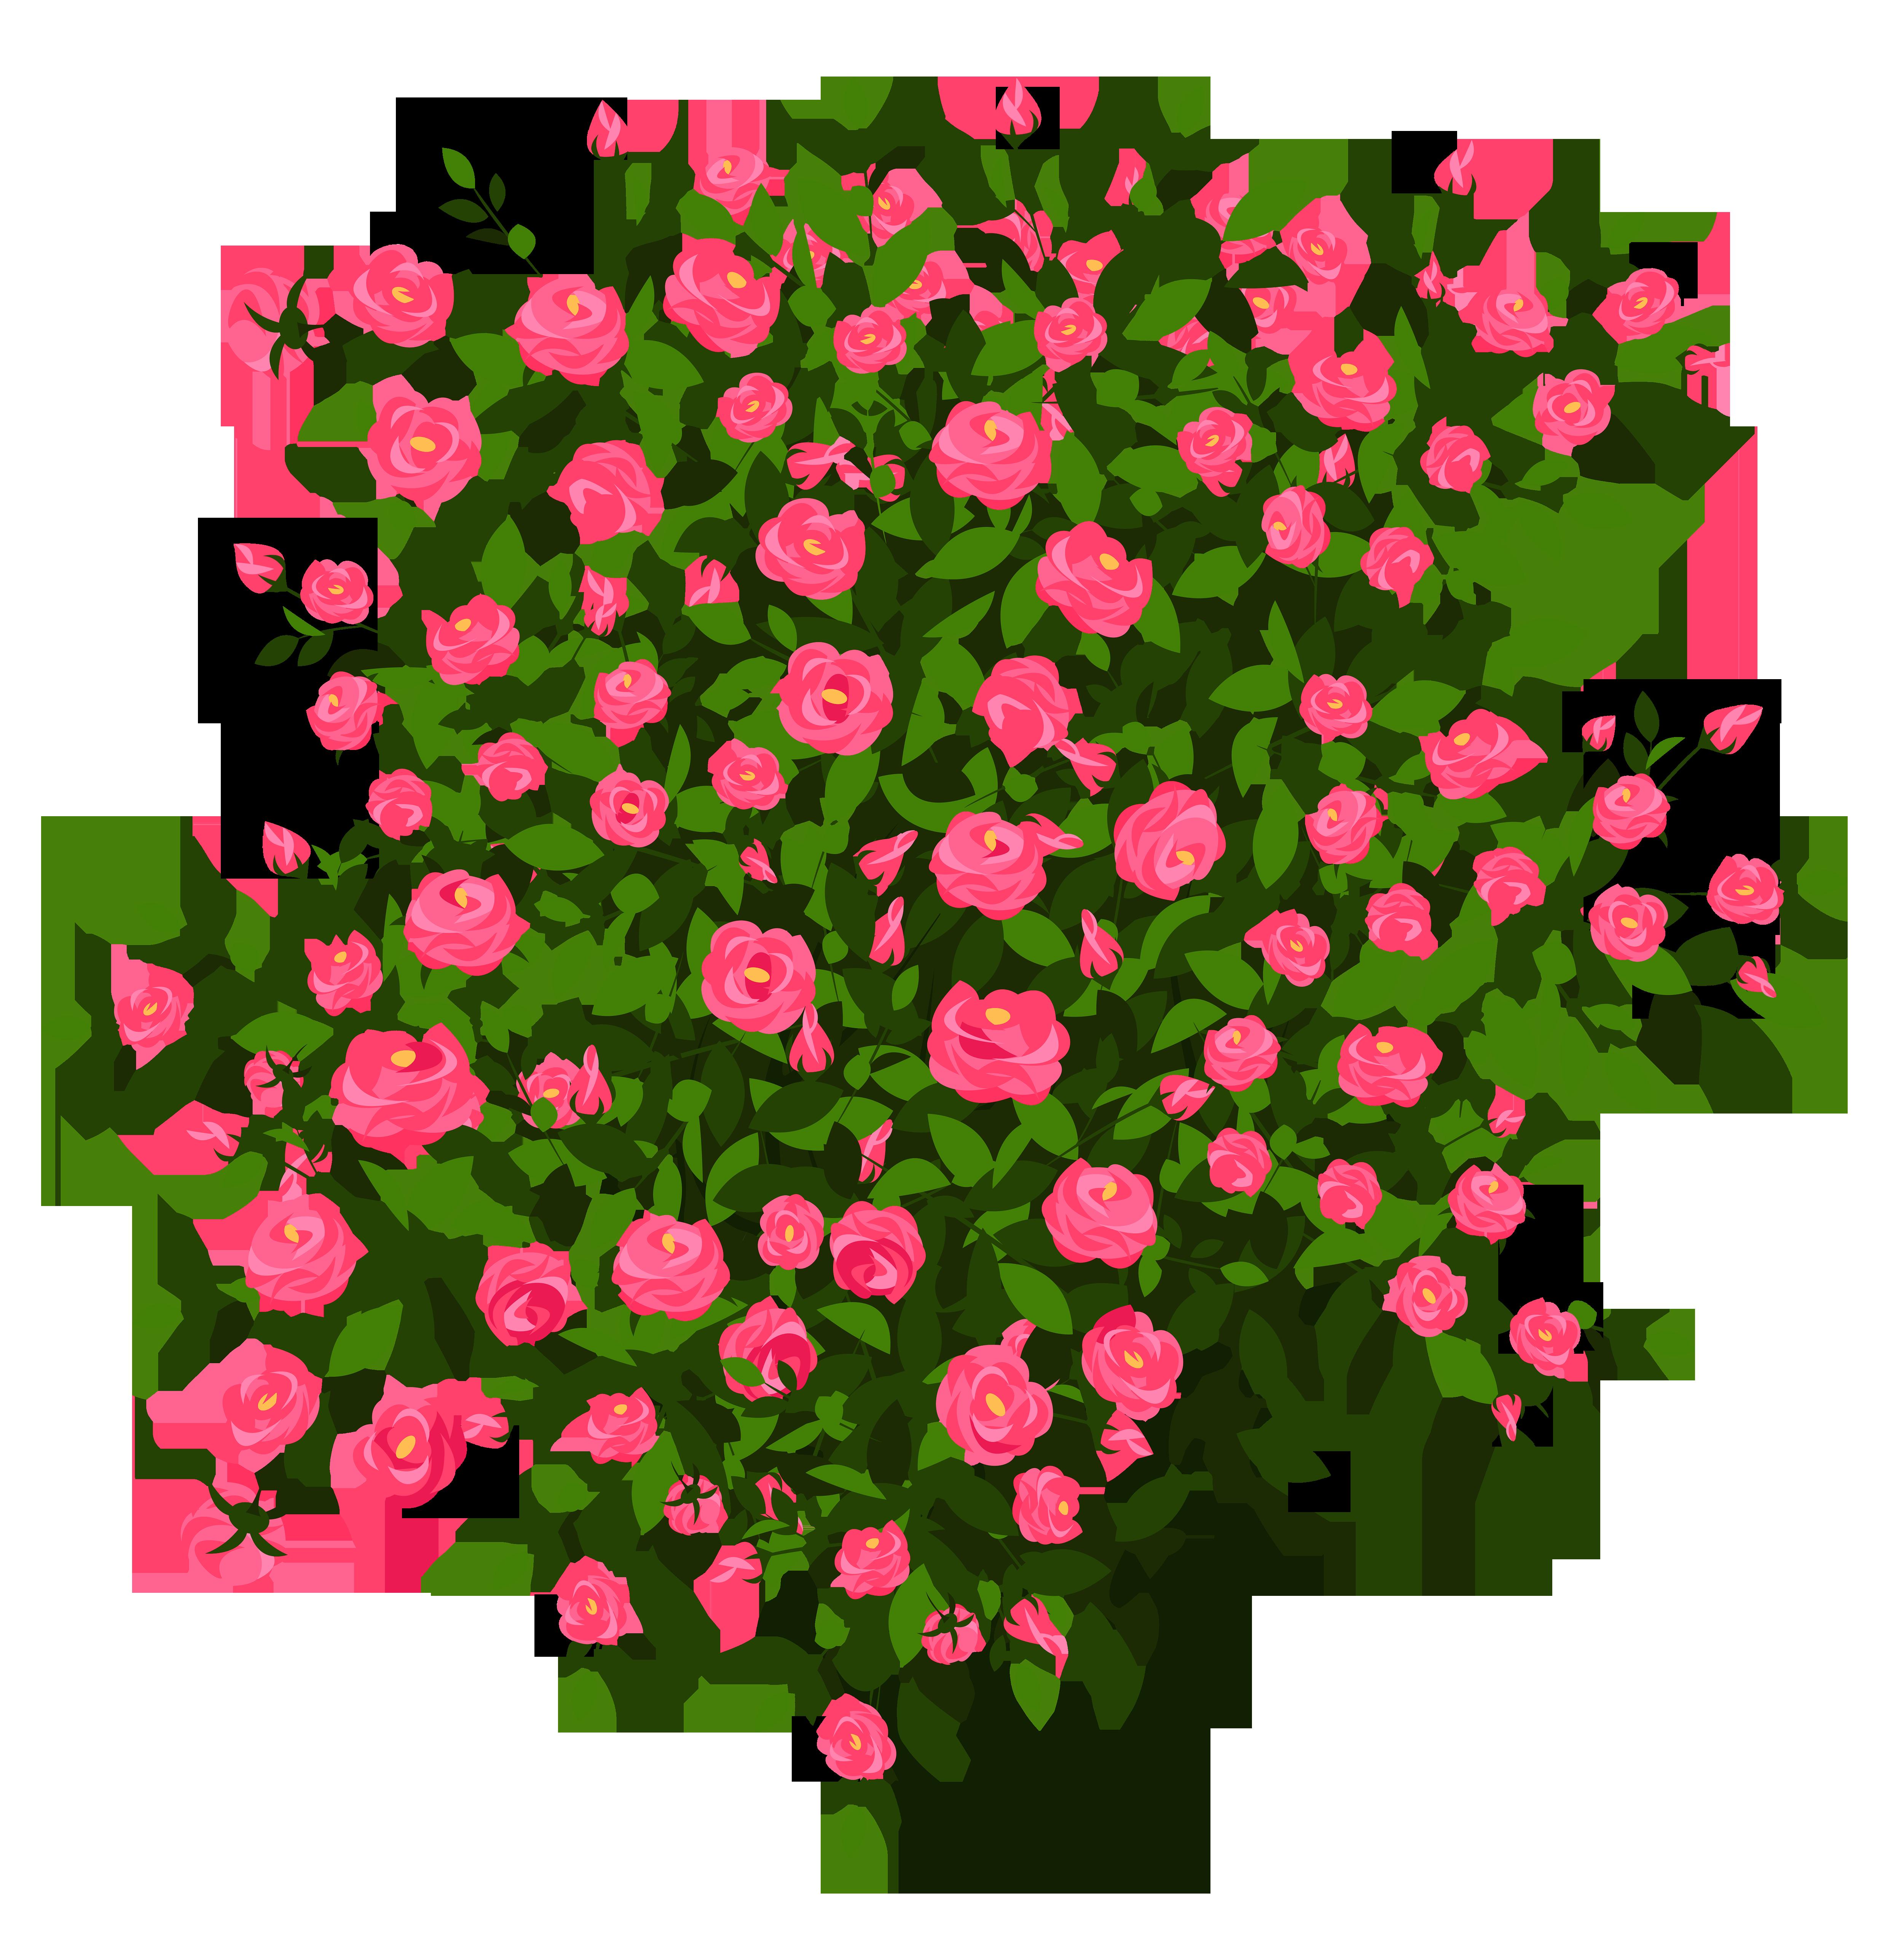 Pink Rose clipart rose bush Bush drawings #16 clipart Rose